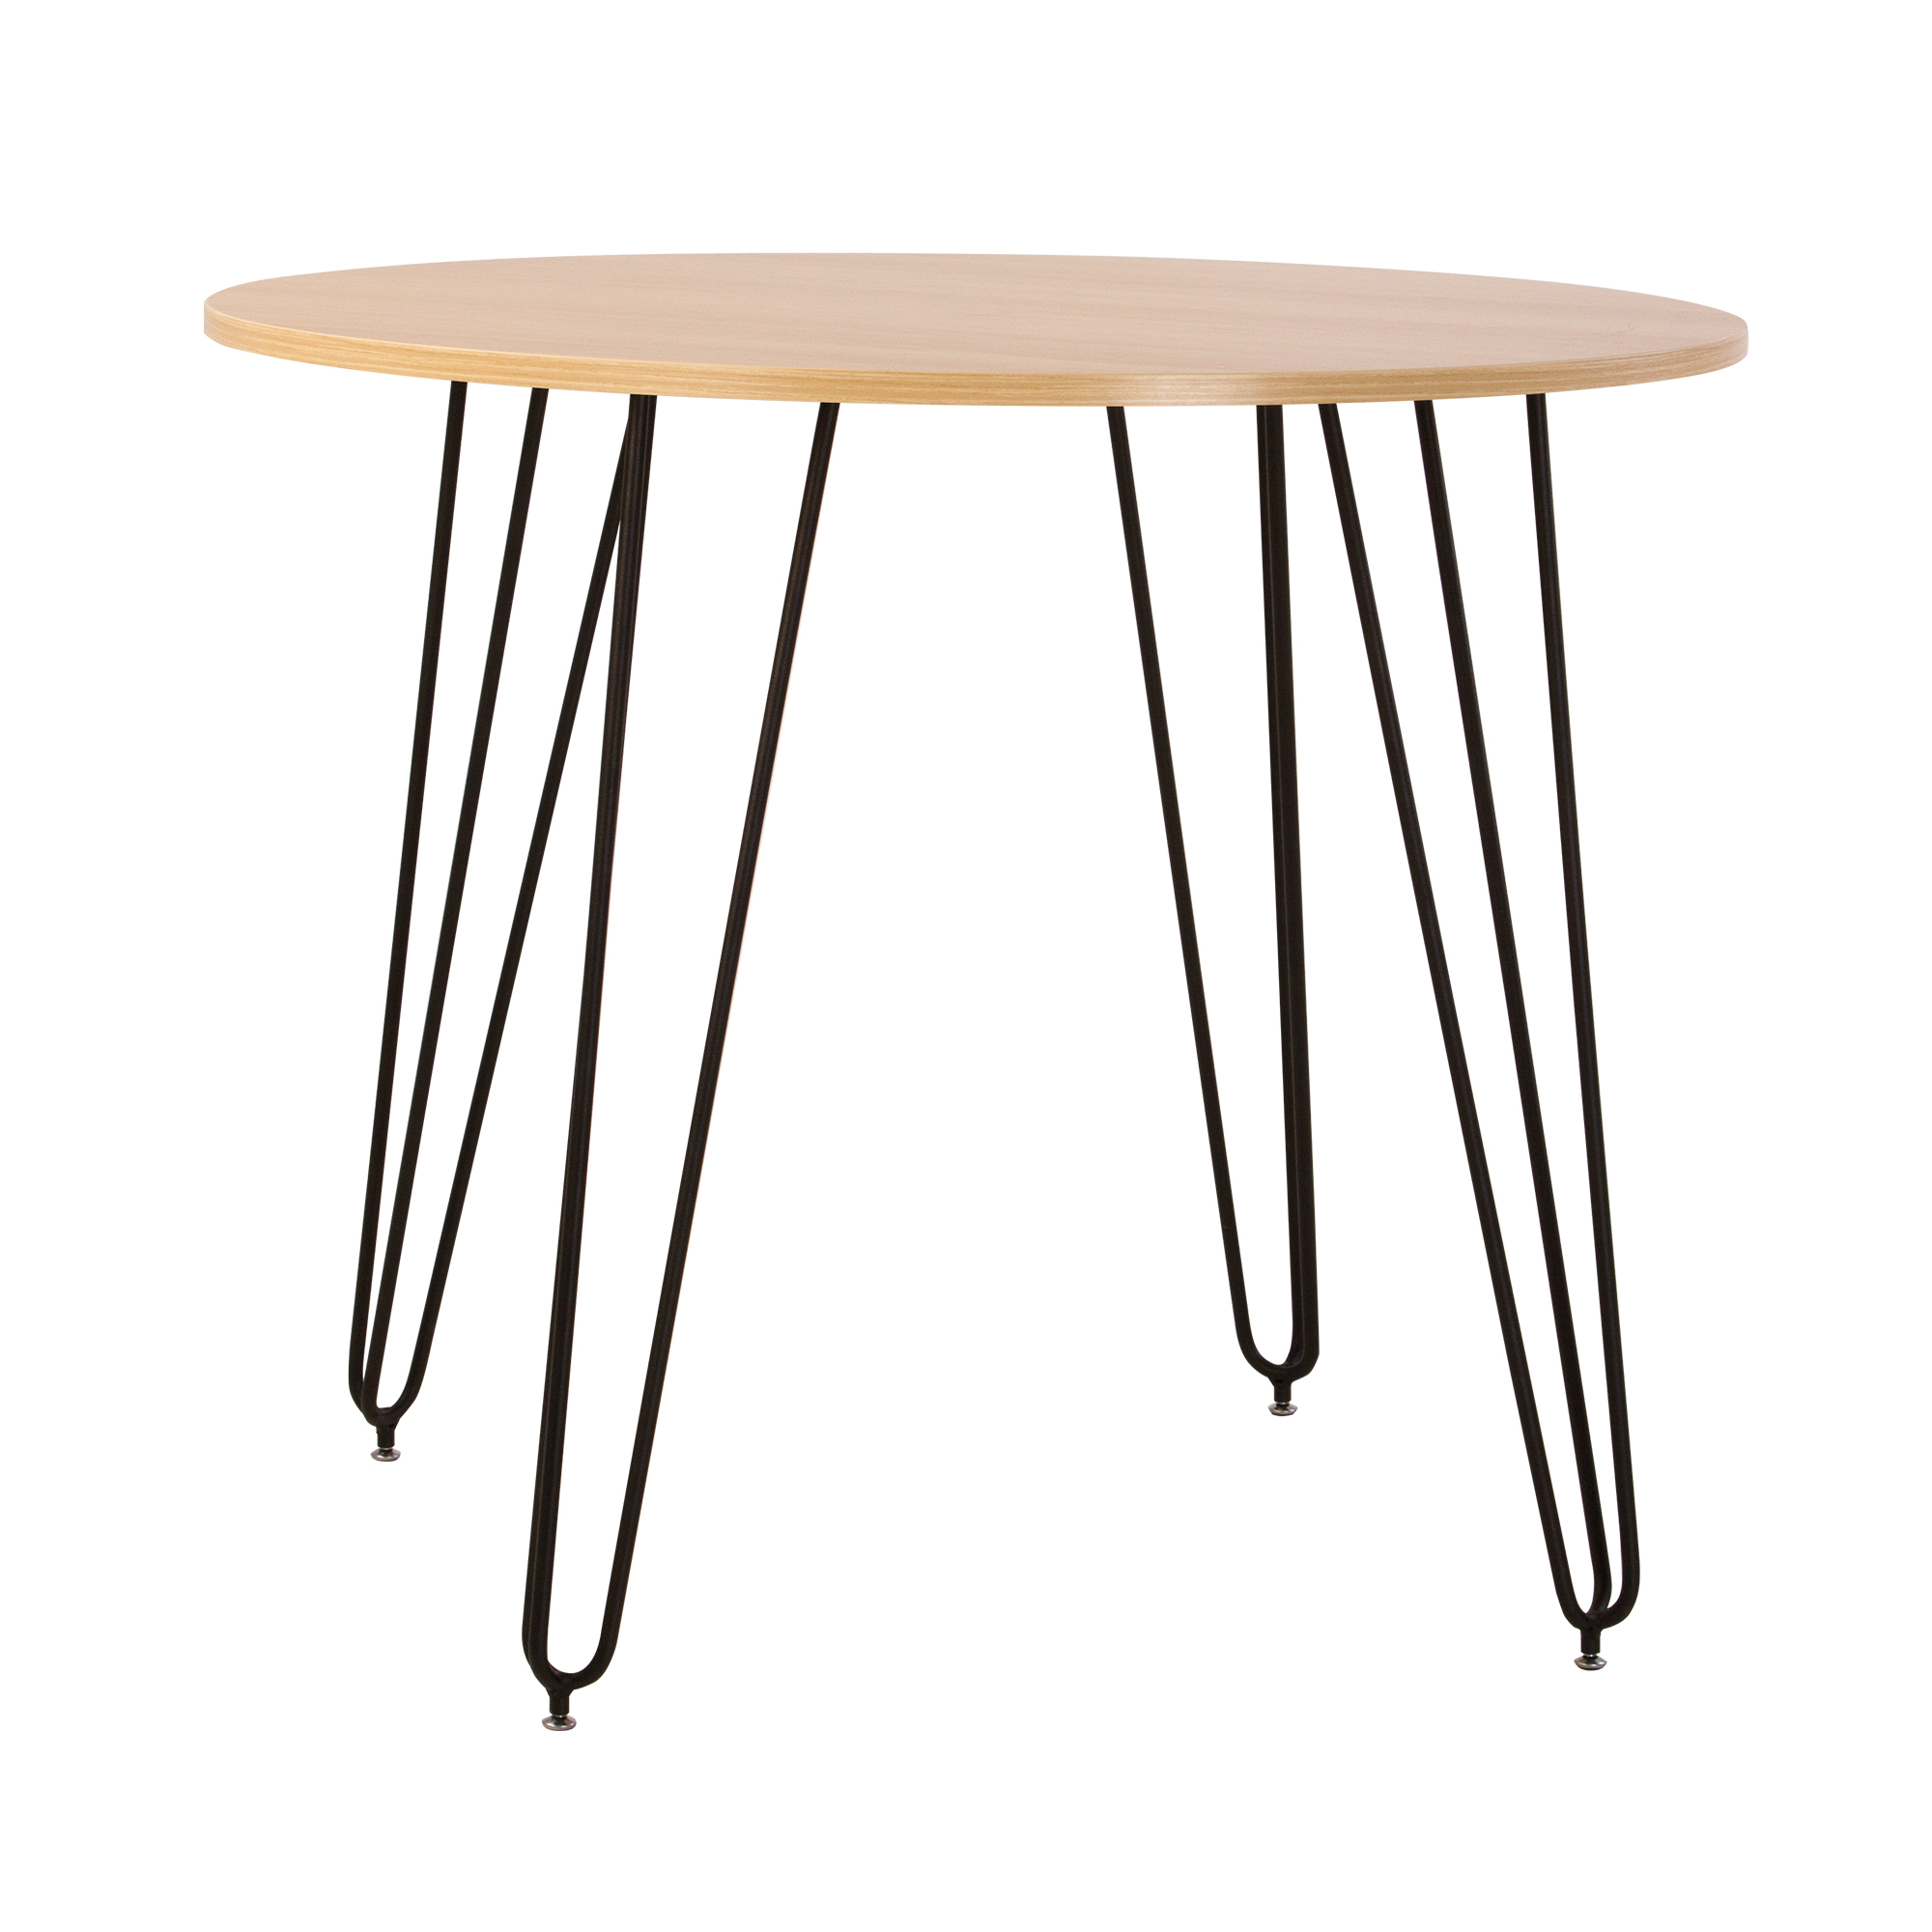 2000x2000px_aller_black_round_table_34_1_2.jpg